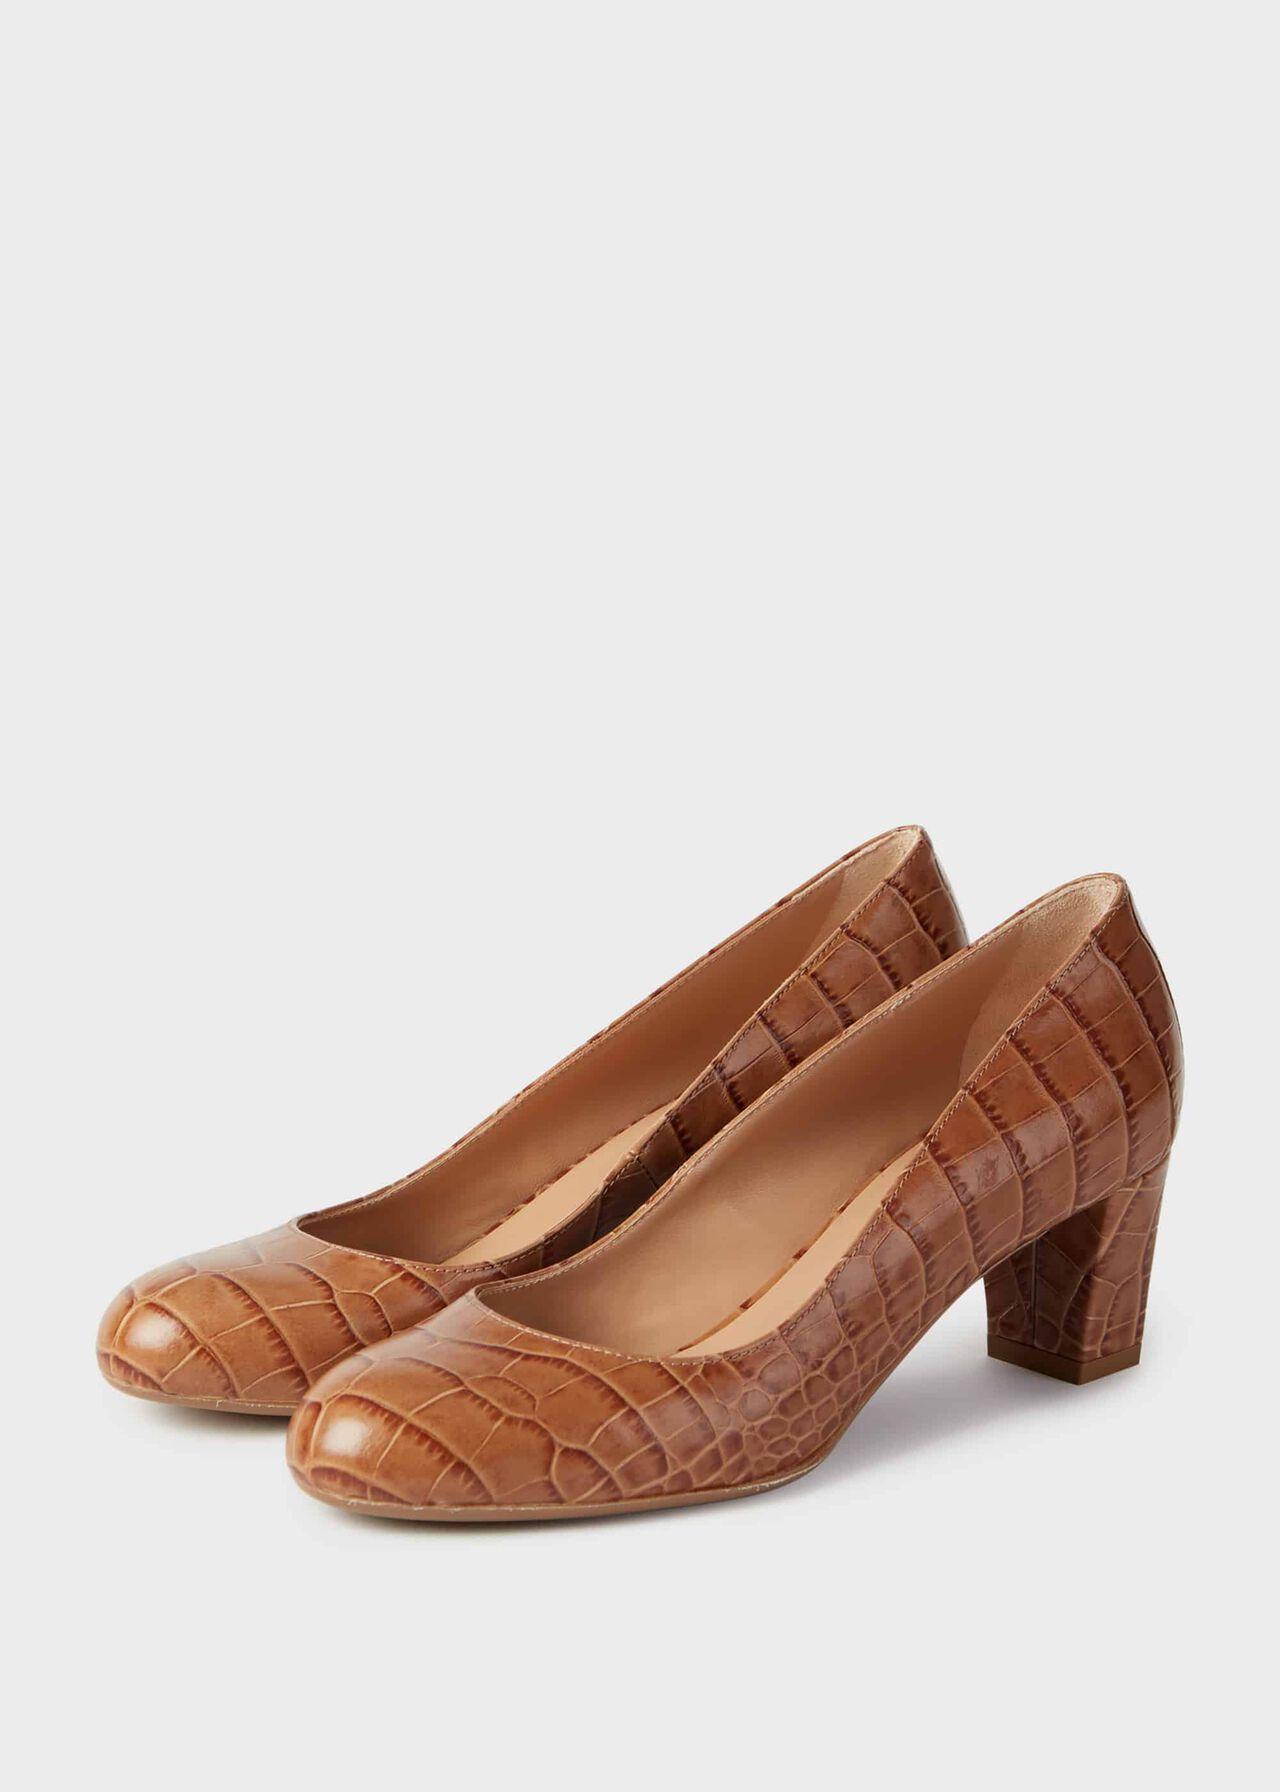 Amber Crocodile Print Block Heel Court Shoes Natural